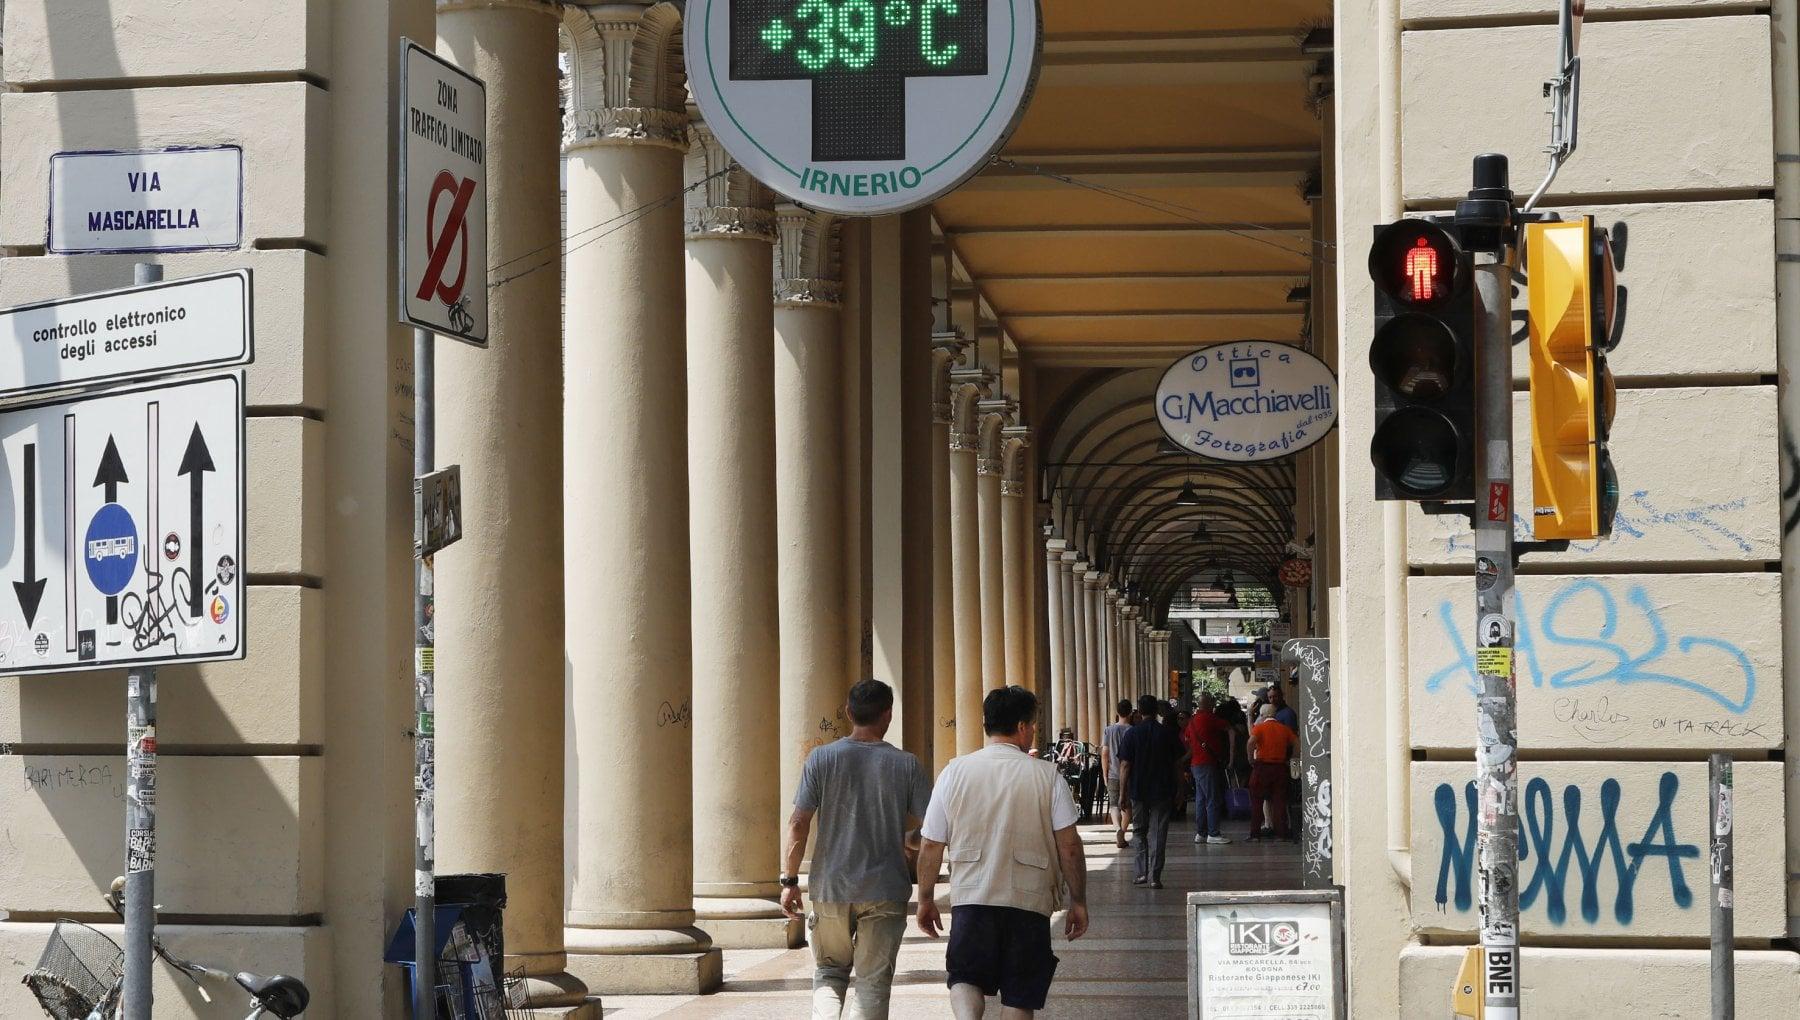 122139635 cc36ecb9 5b00 42af aaf2 2d893a890a6d - Arriva Lucifero e sarà la settimana più calda dell'estate. Bollino rosso per 8 città